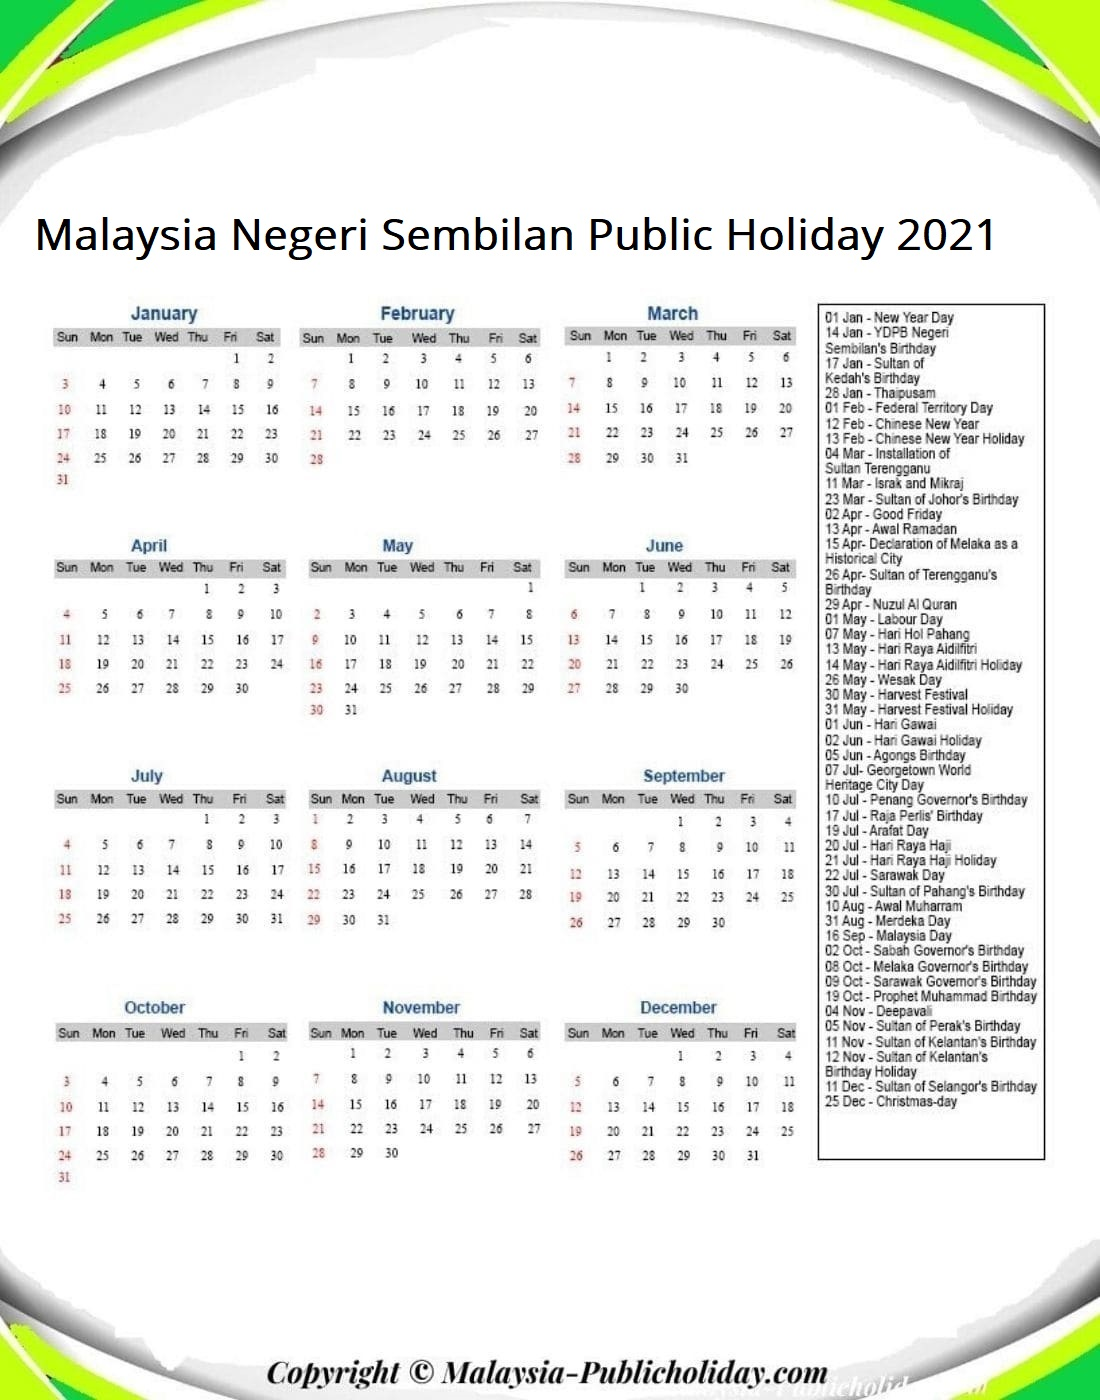 Negeri Sembilan Calendars with Holidays 2021